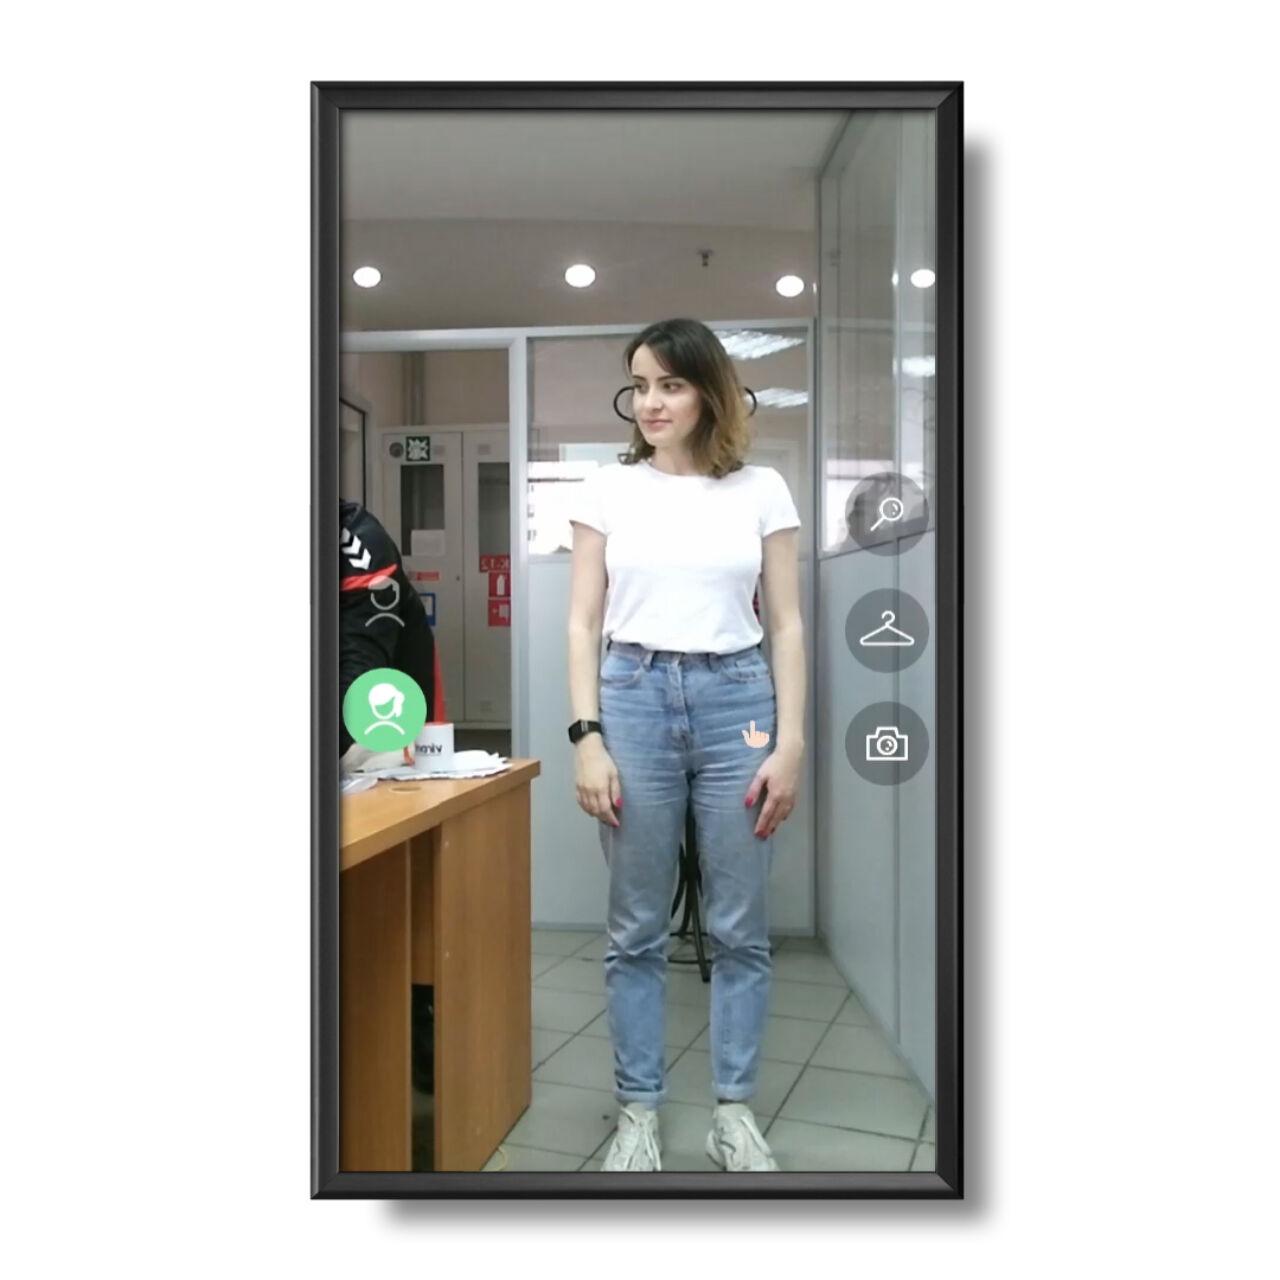 AR Fitting Room - t-shirt